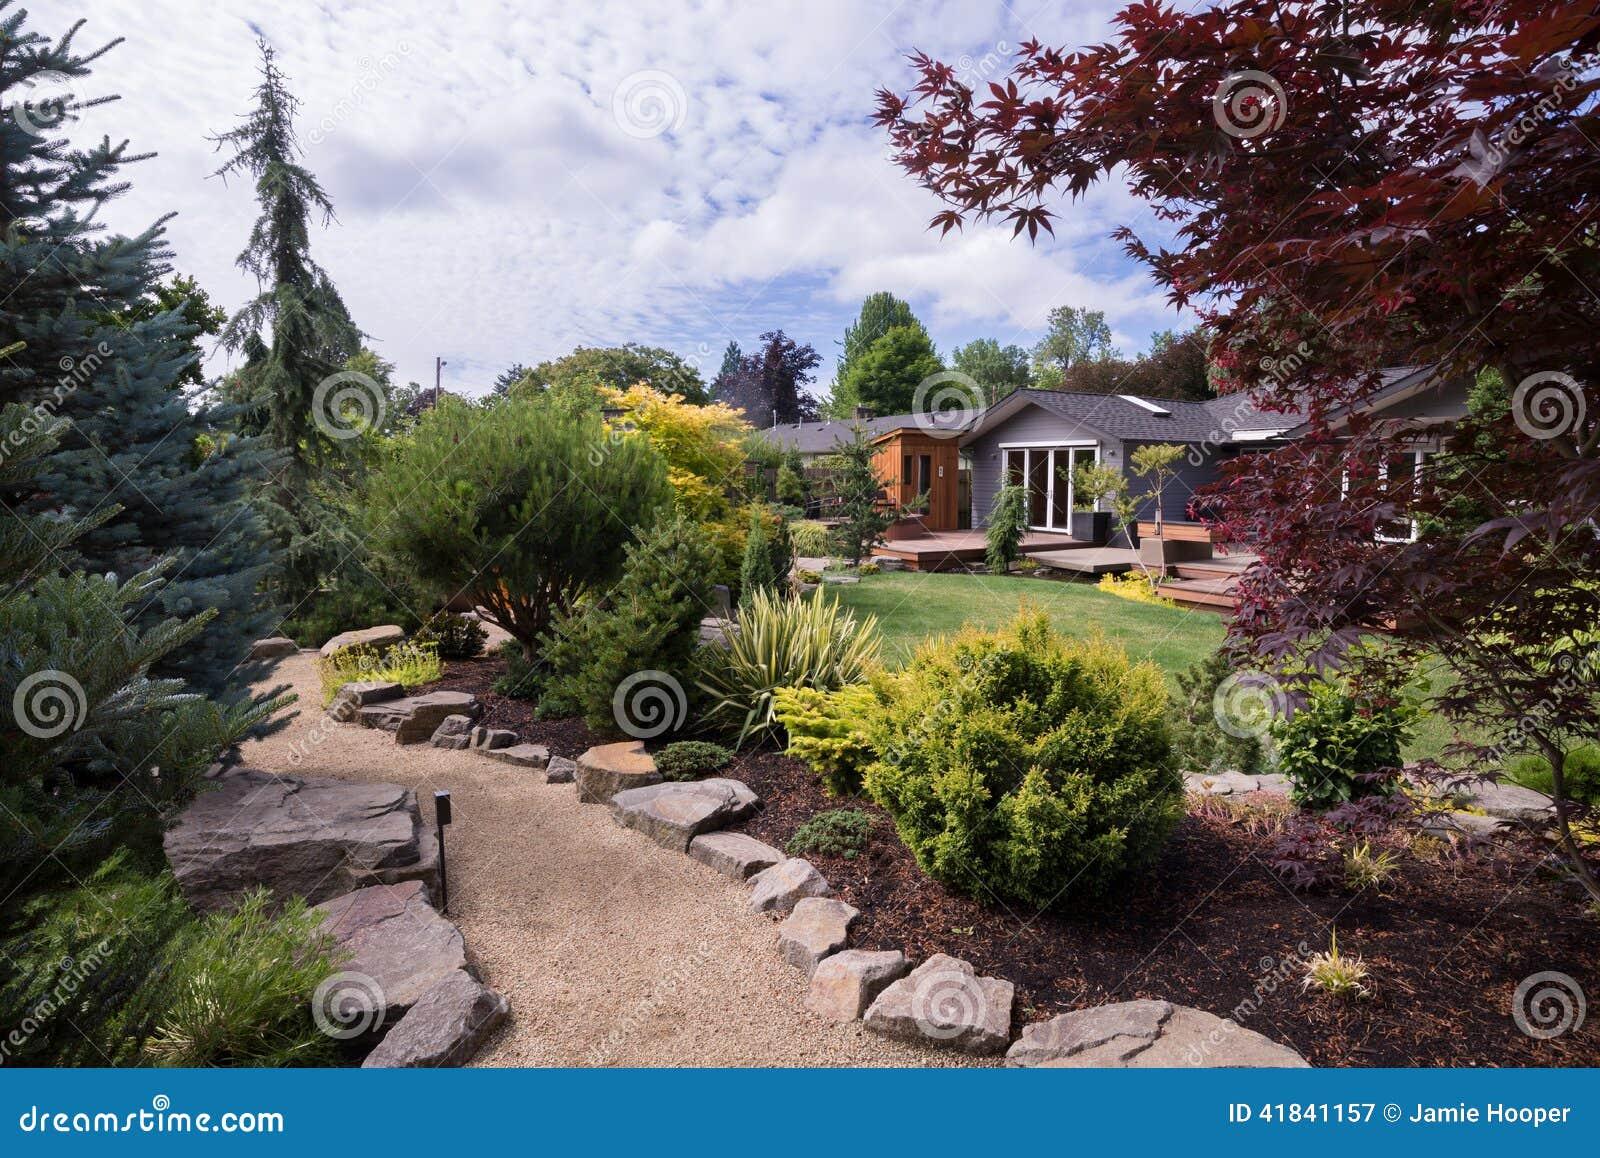 Garden Walkway Home Stock Photo - Image: 41841157